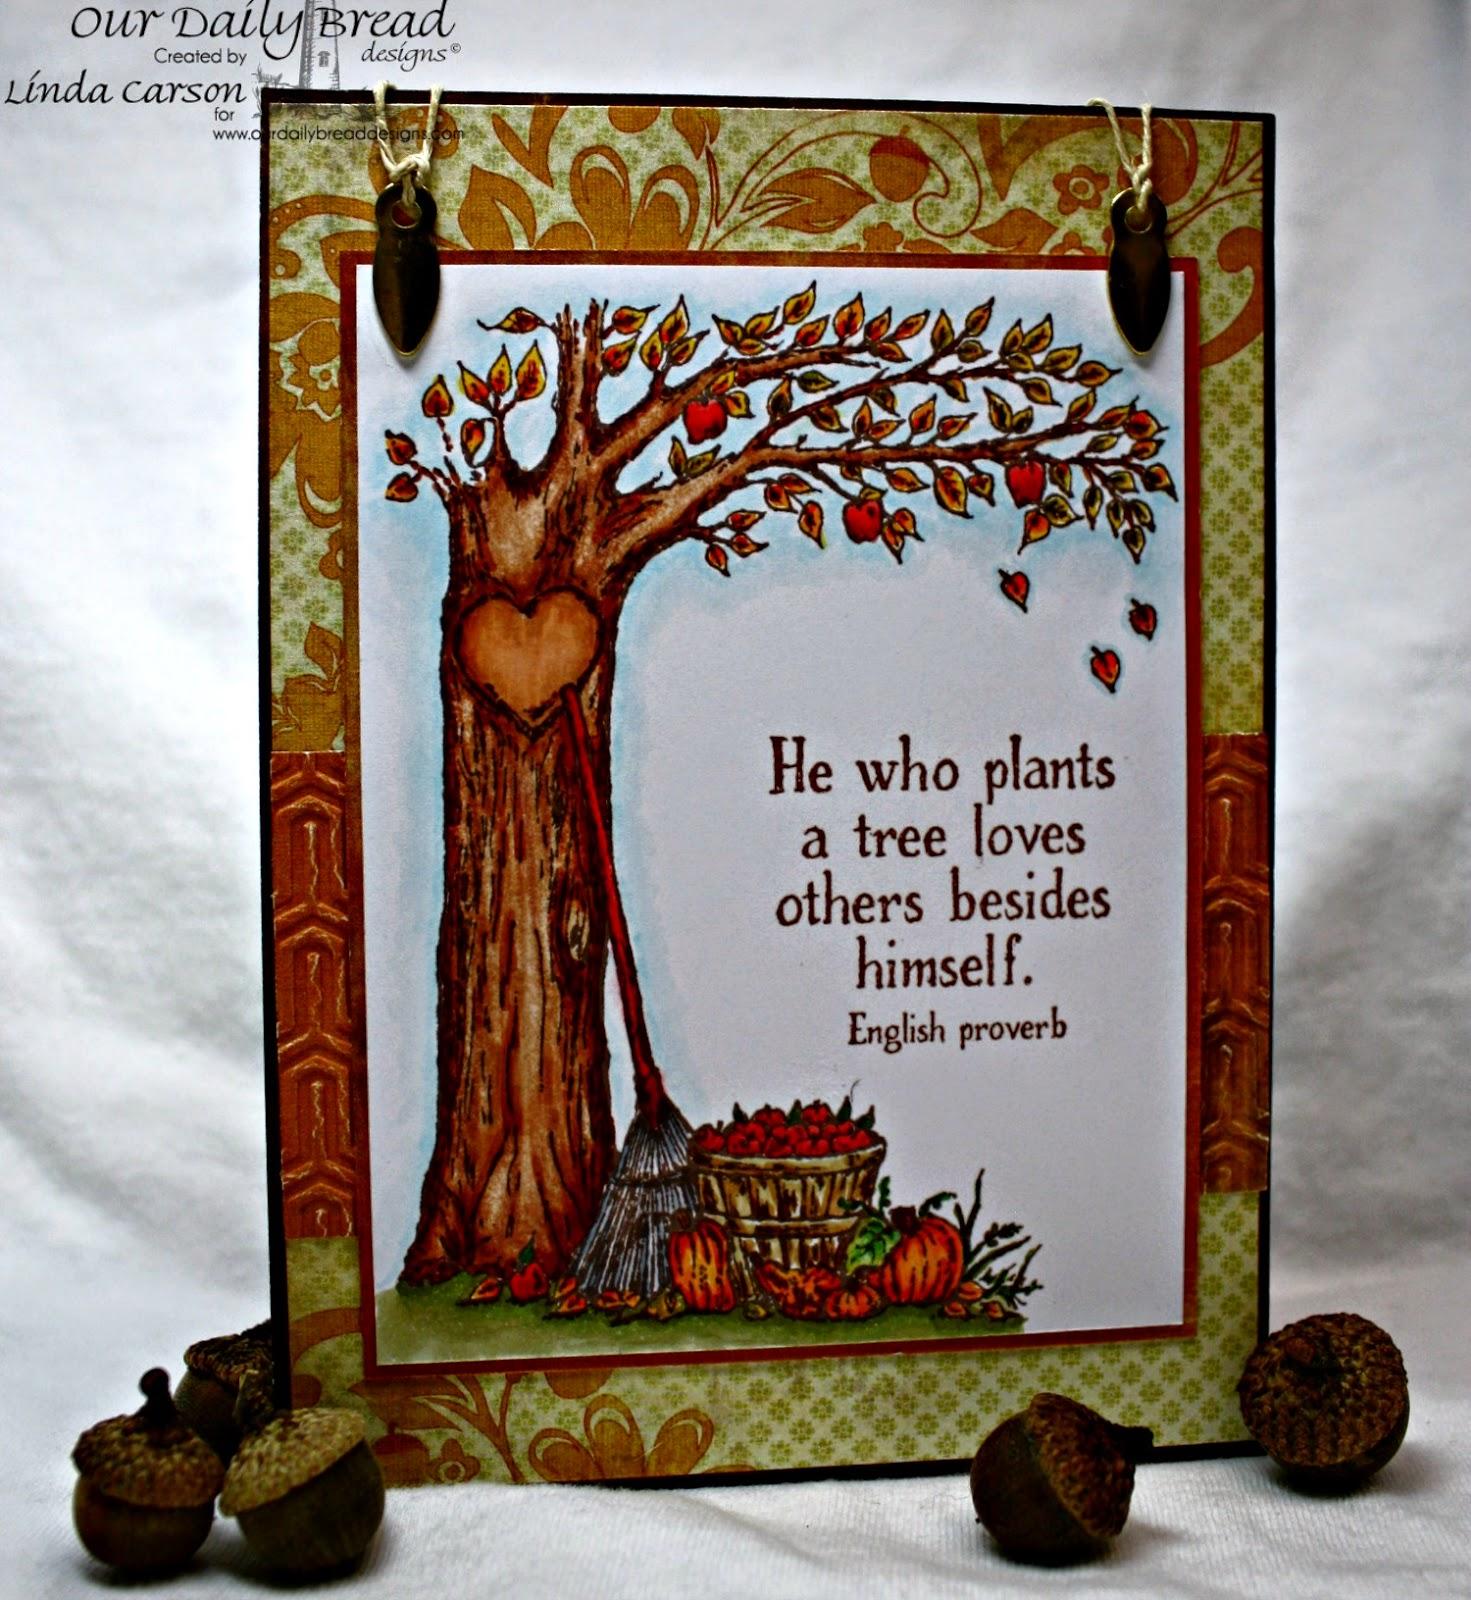 Our Daily Bread Designs, Autumn Tree, designer Linda Carson